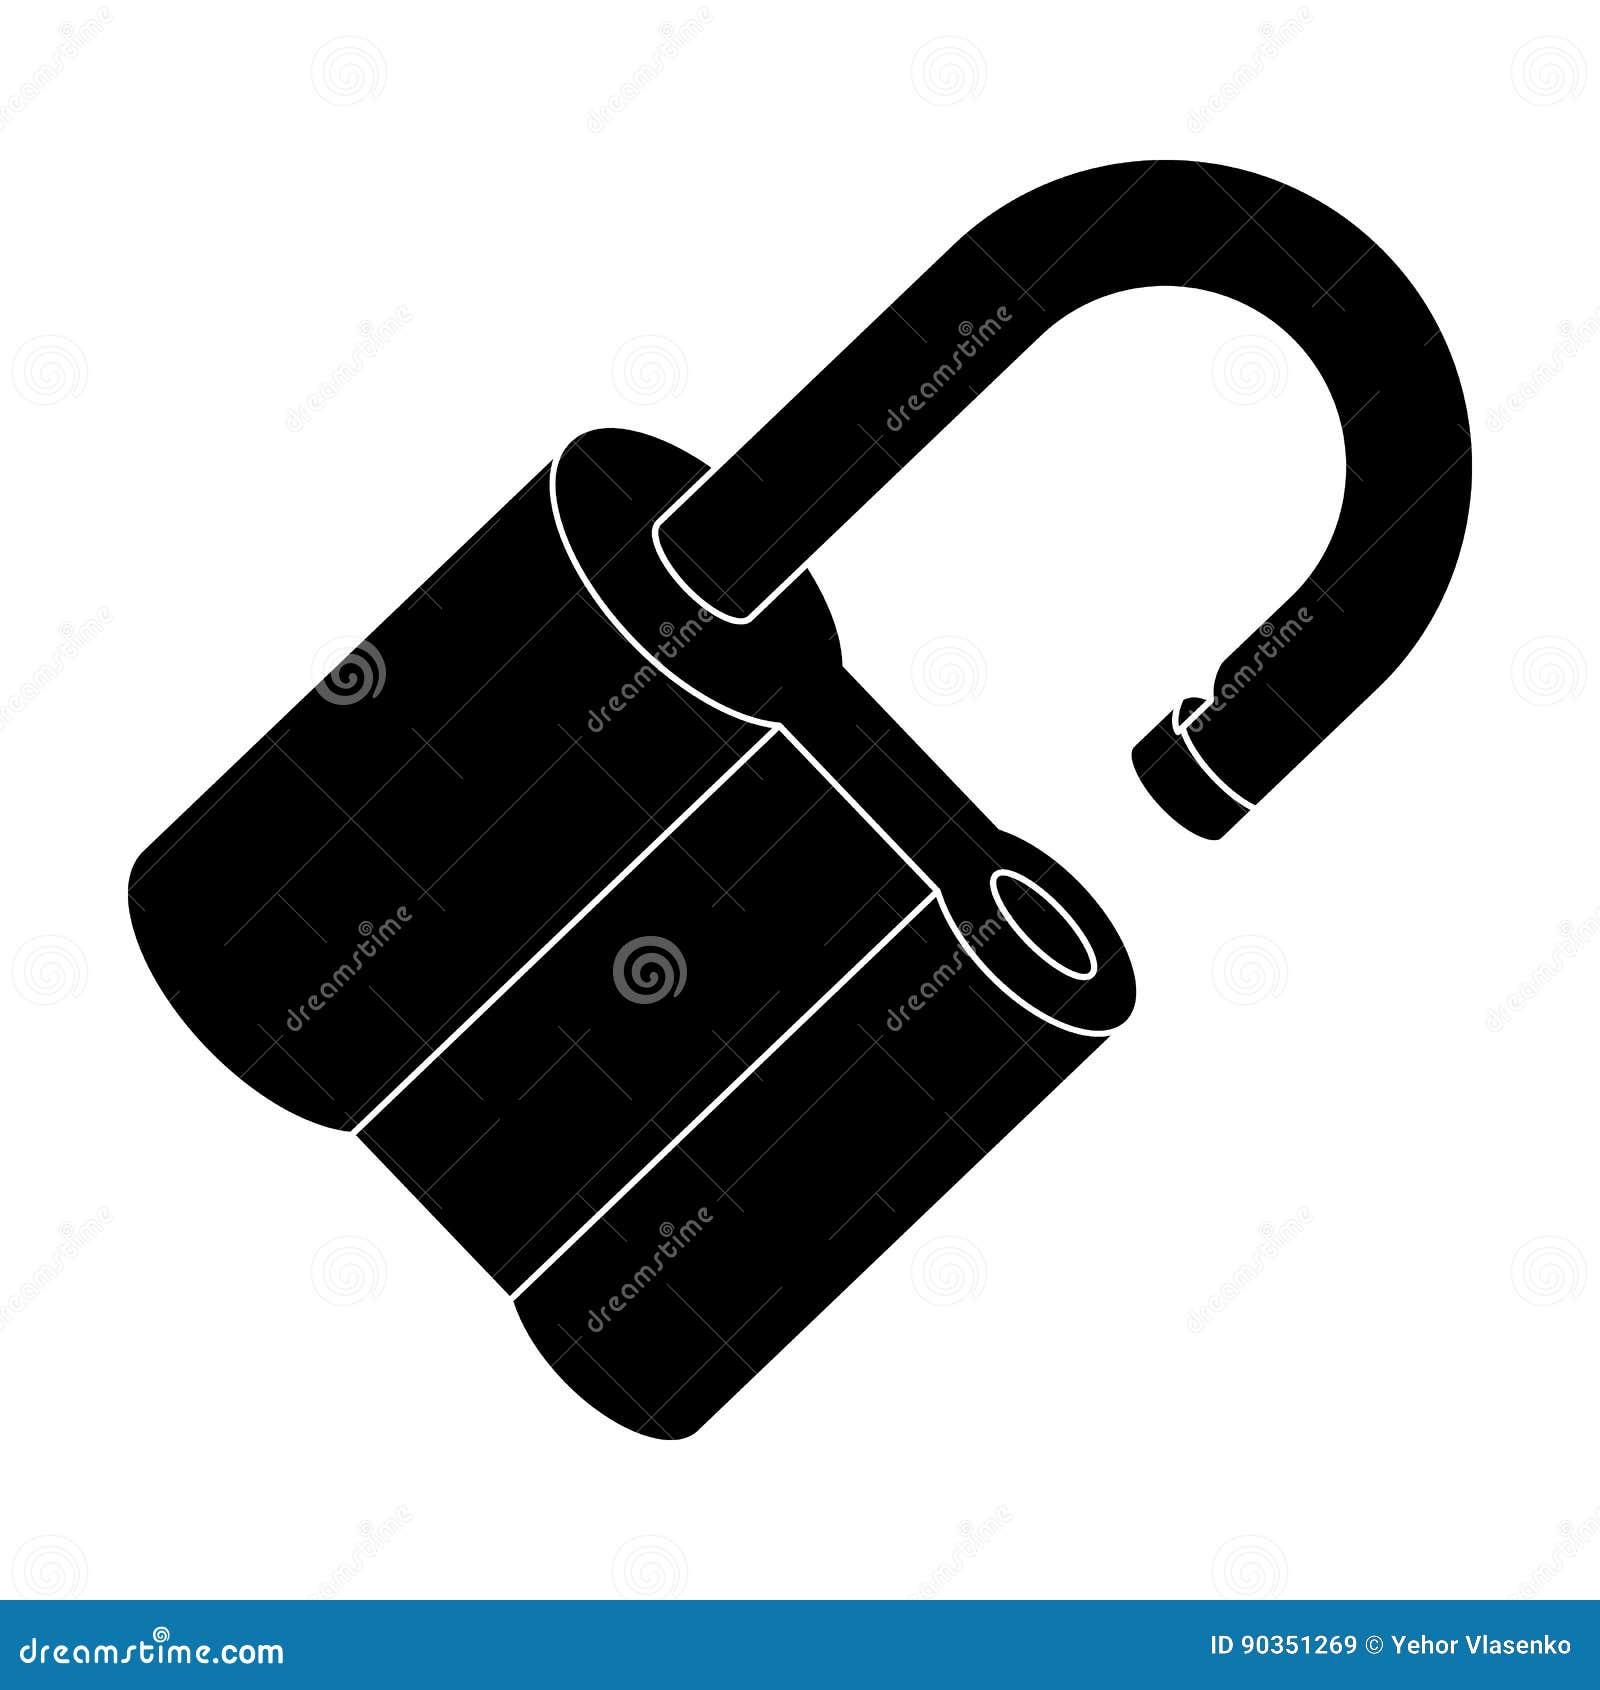 Cadeado cortado O desafio para que o descobridor resolva o crime Único ícone do detetive no símbolo do vetor do estilo de blake